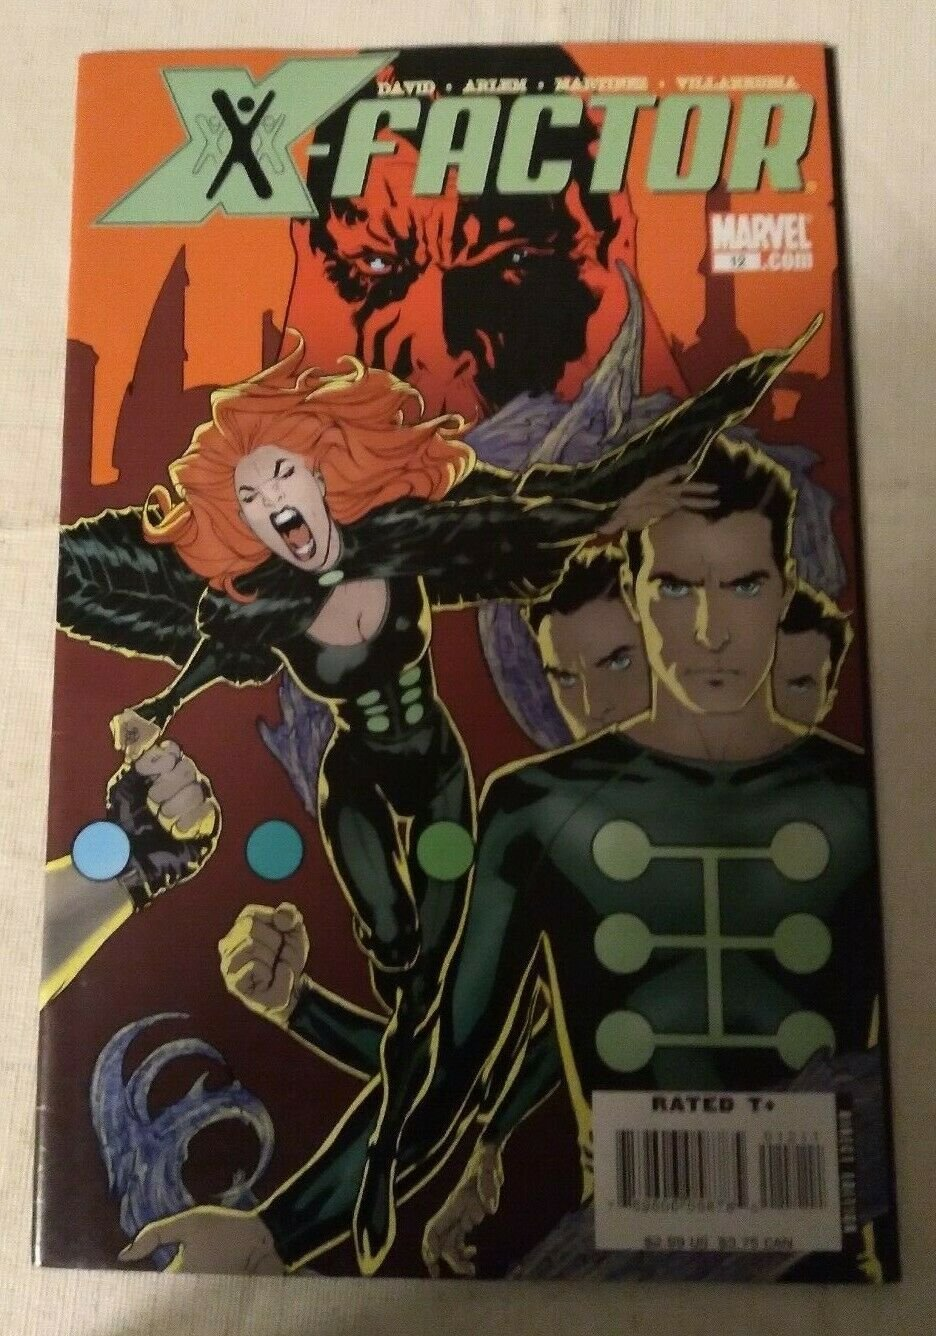 X-Factor #12 VF/NM Peter David Marvel Comics X-men Xmen